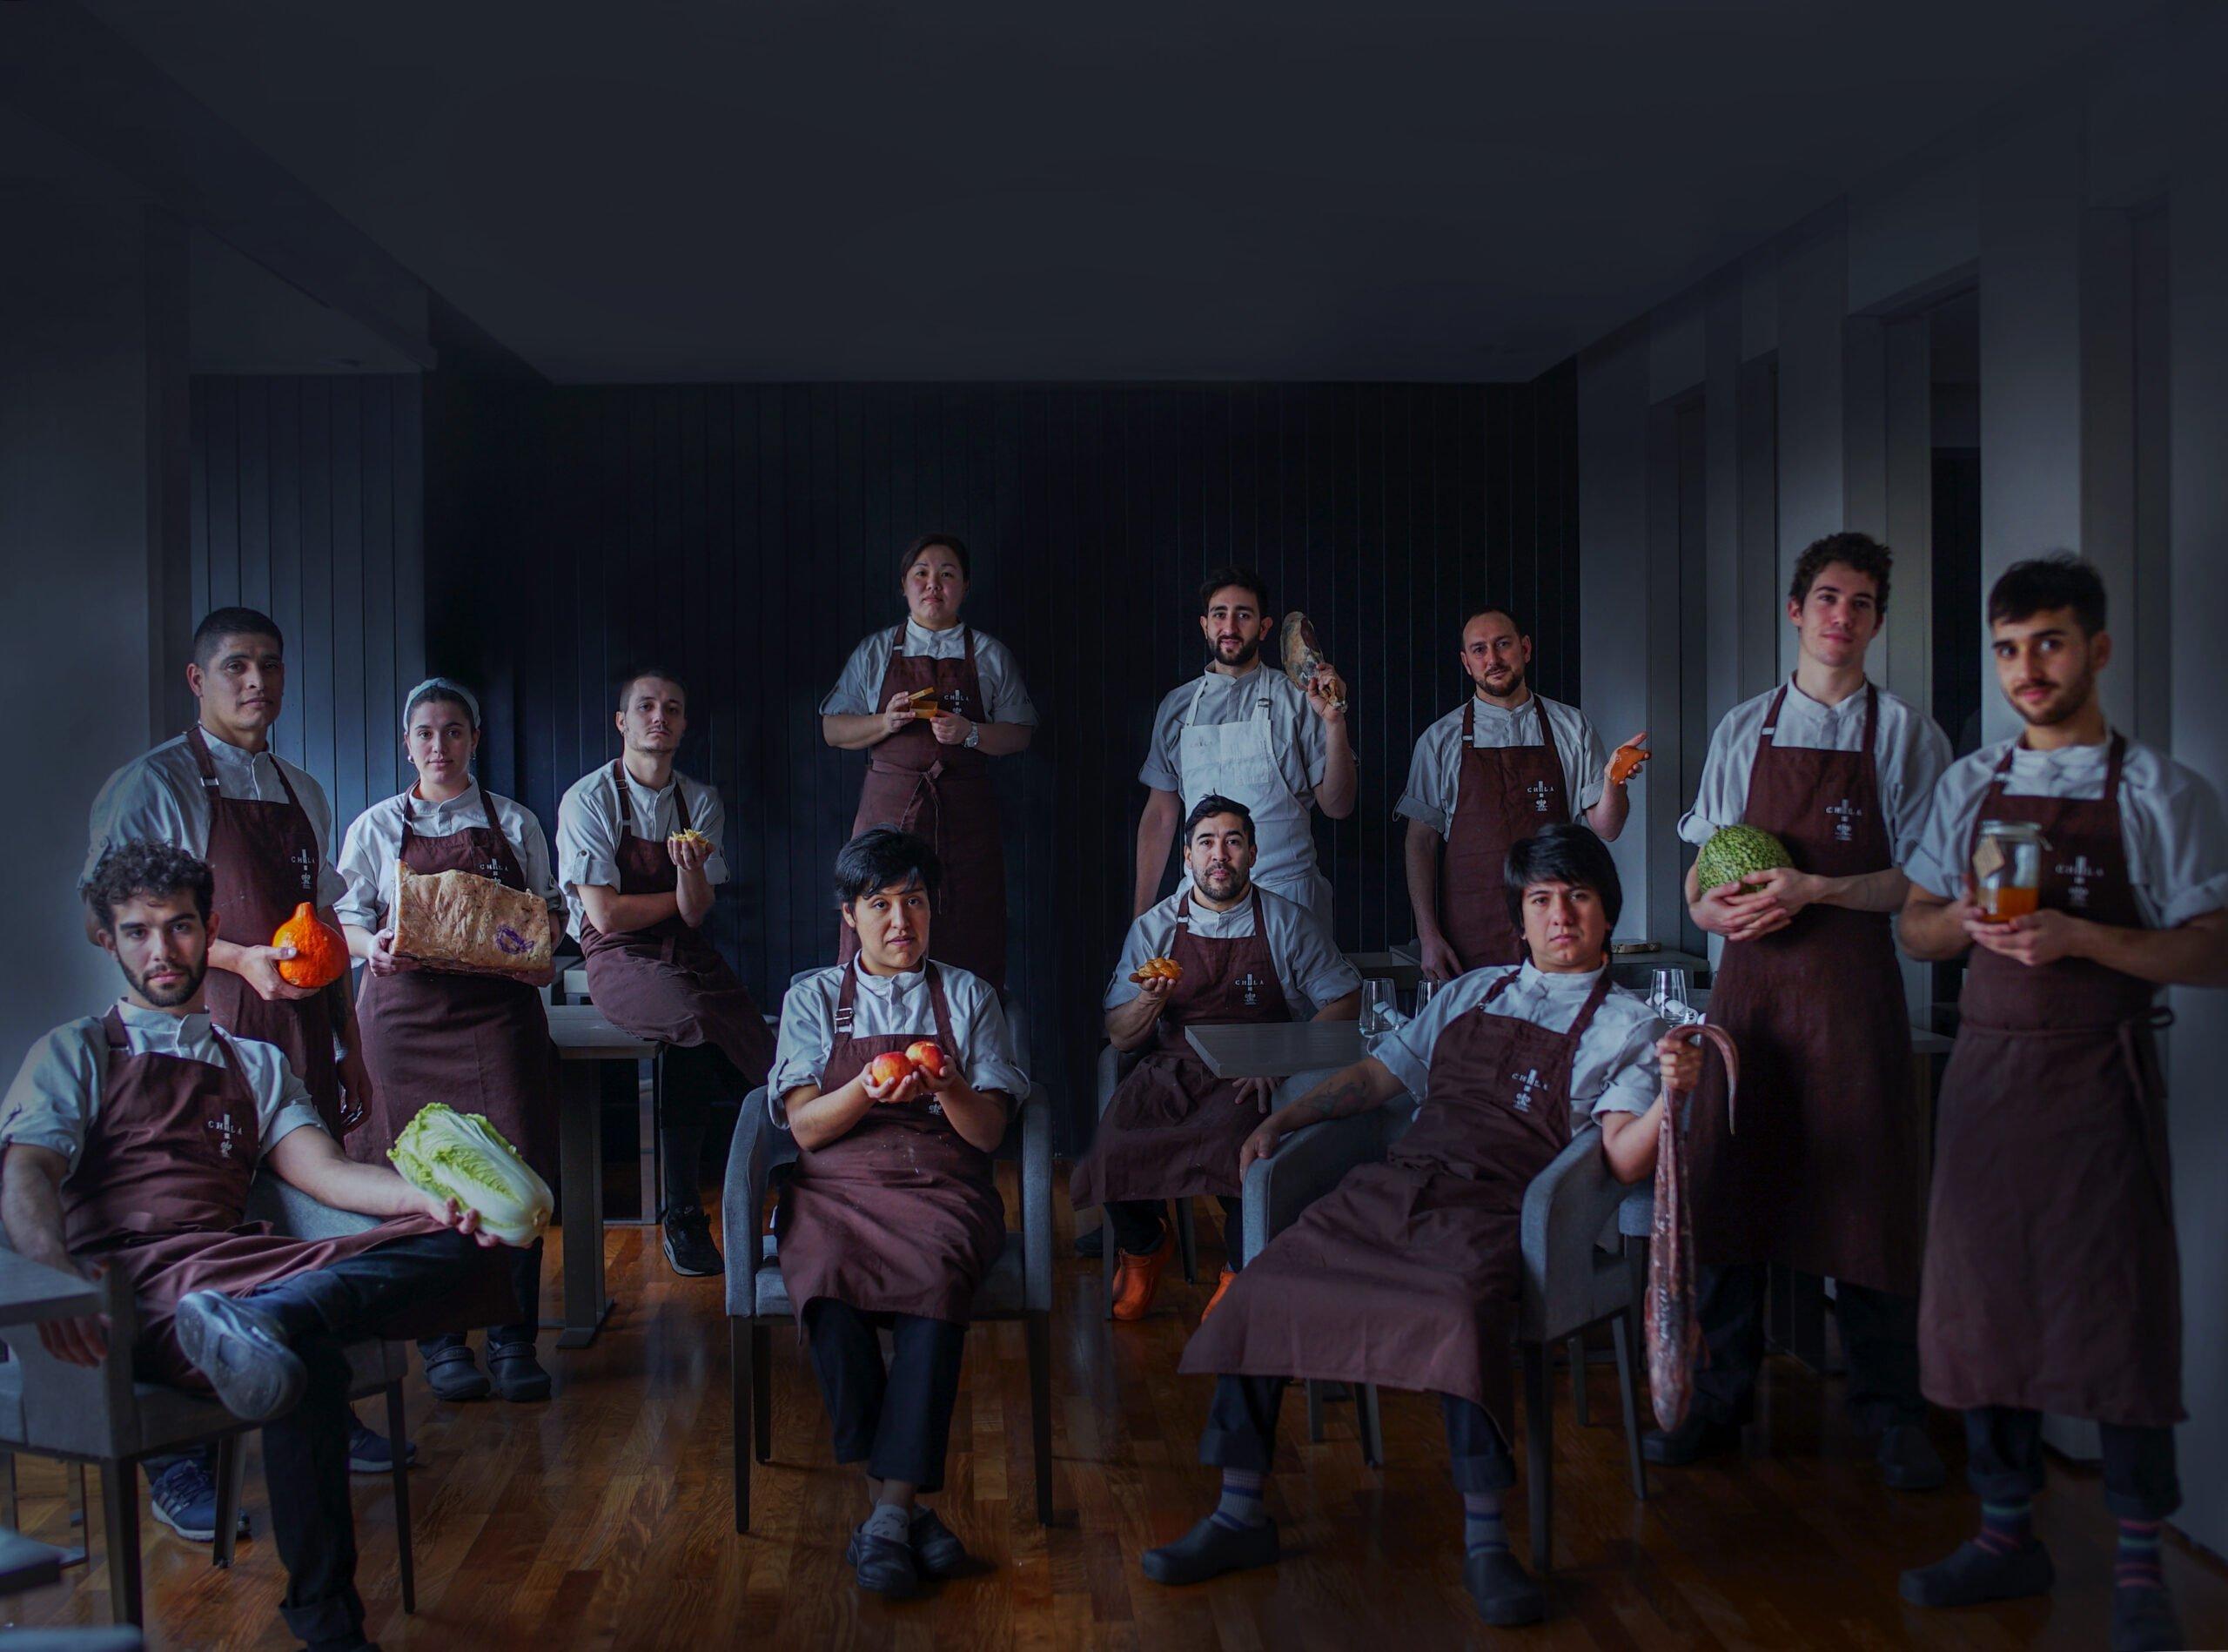 https://www.chilarestaurant.com/equipo-cocina-chila-2019-2/